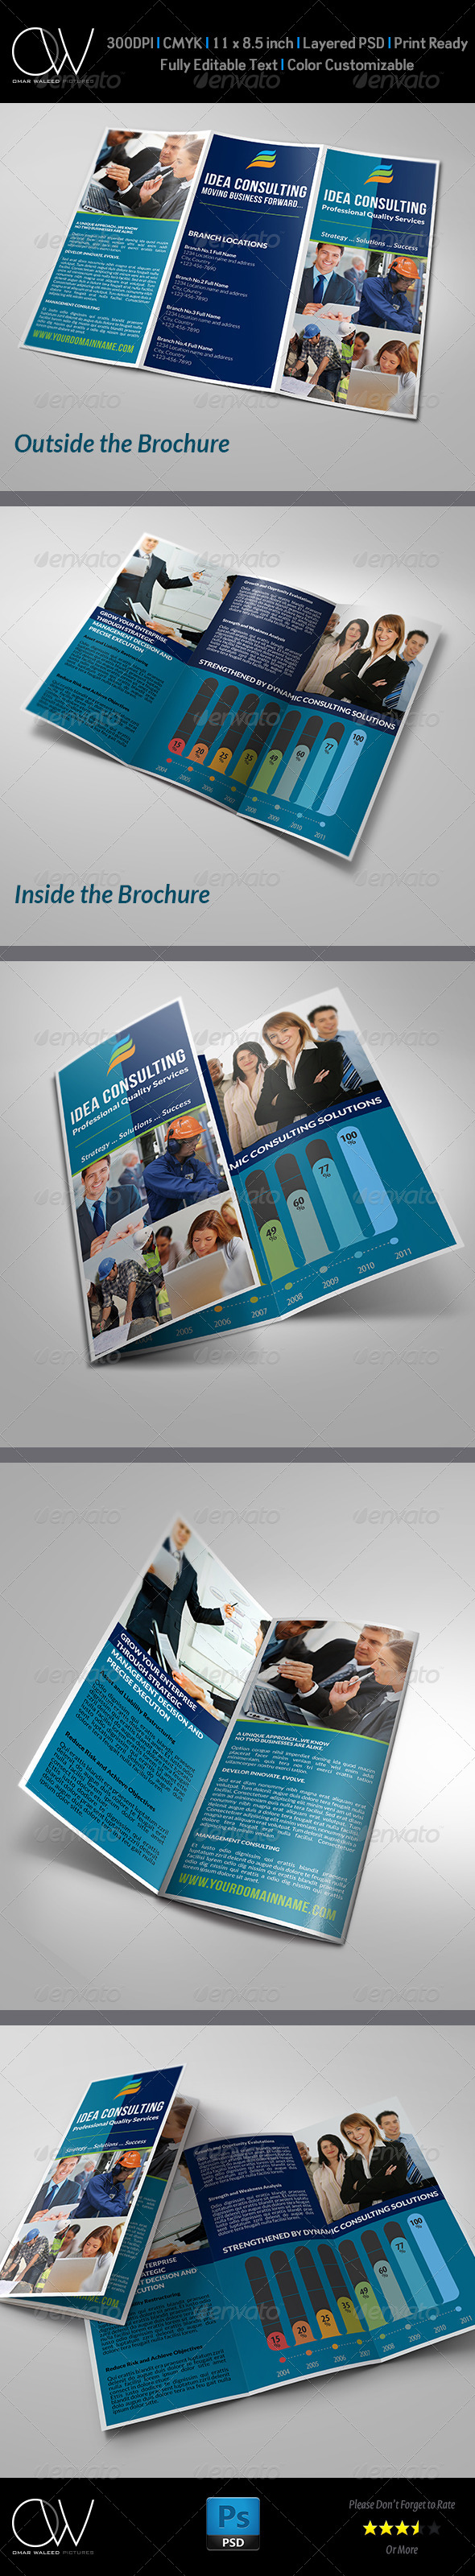 Corporate Business Tri-Fold Brochure Vol.2